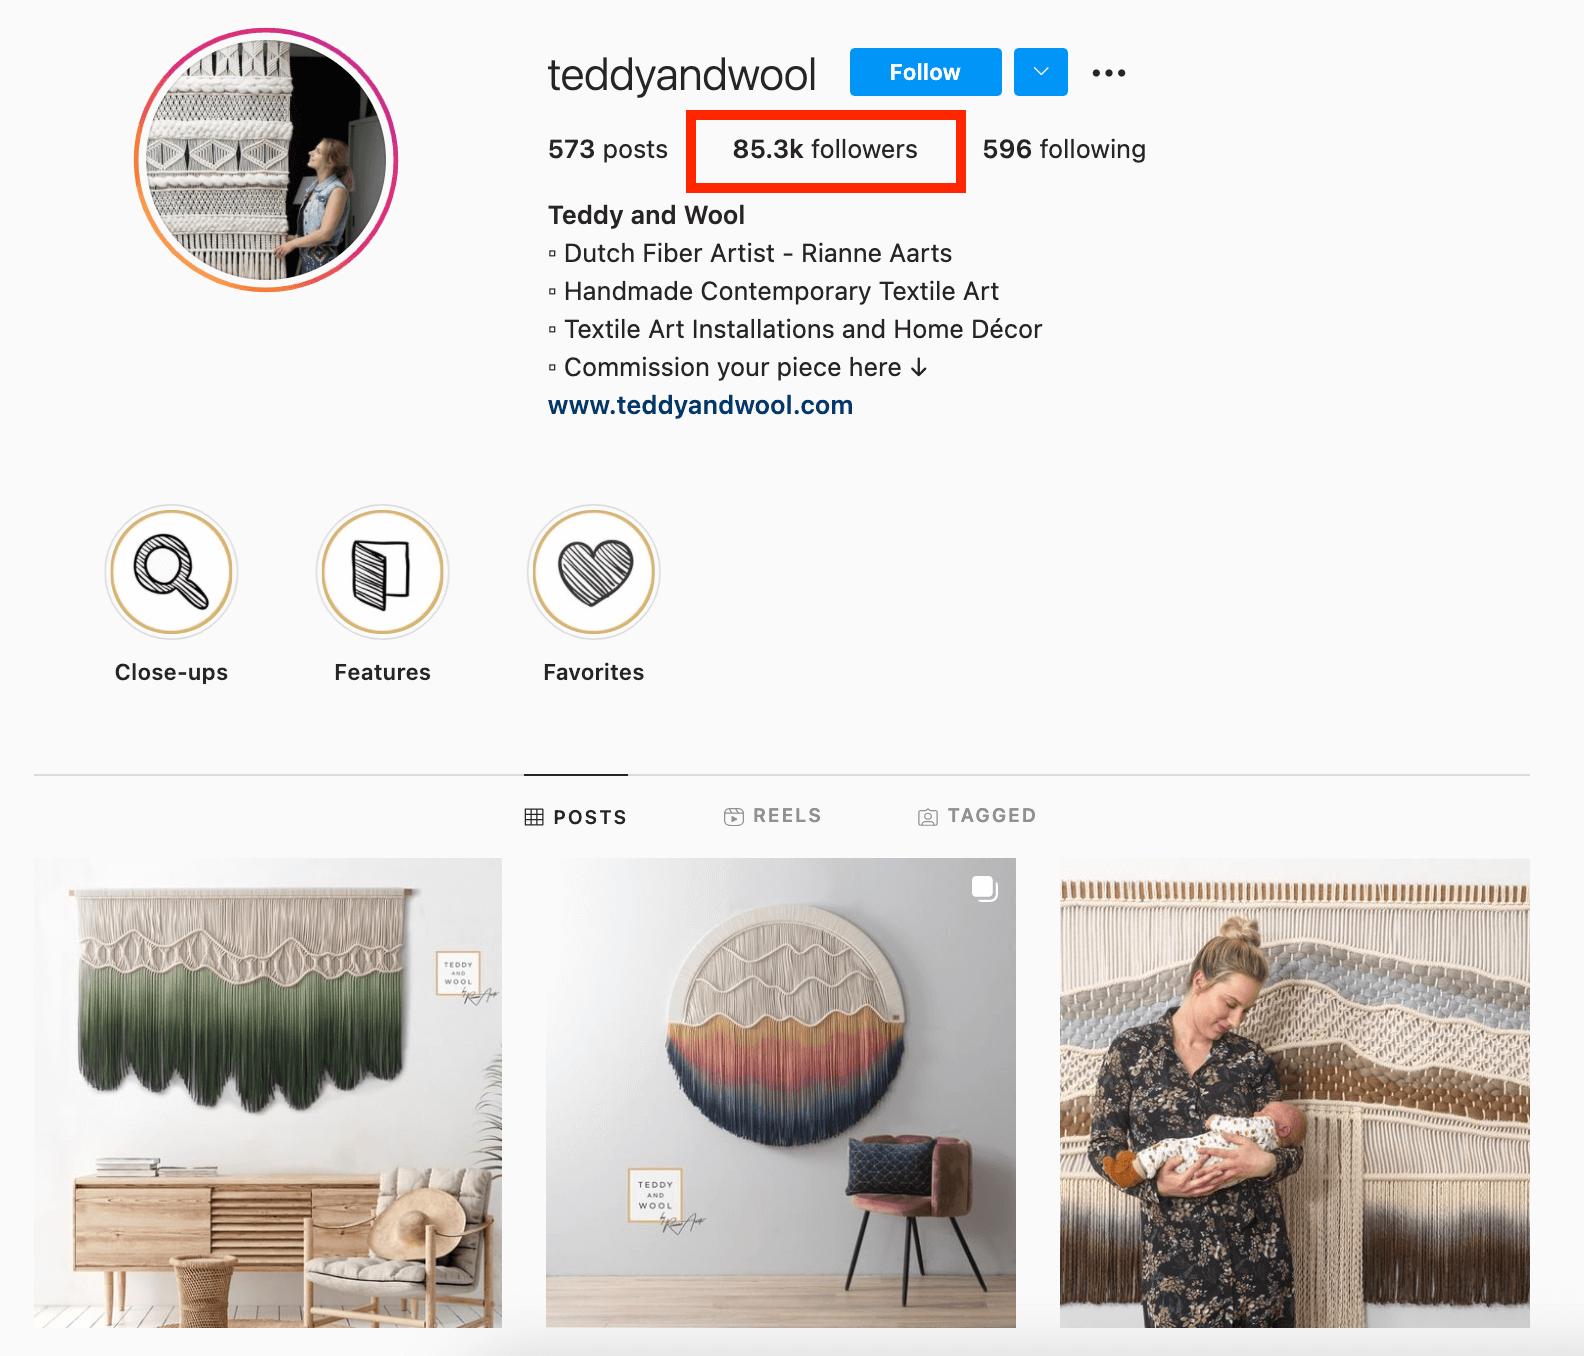 Etsy creator instagram profile